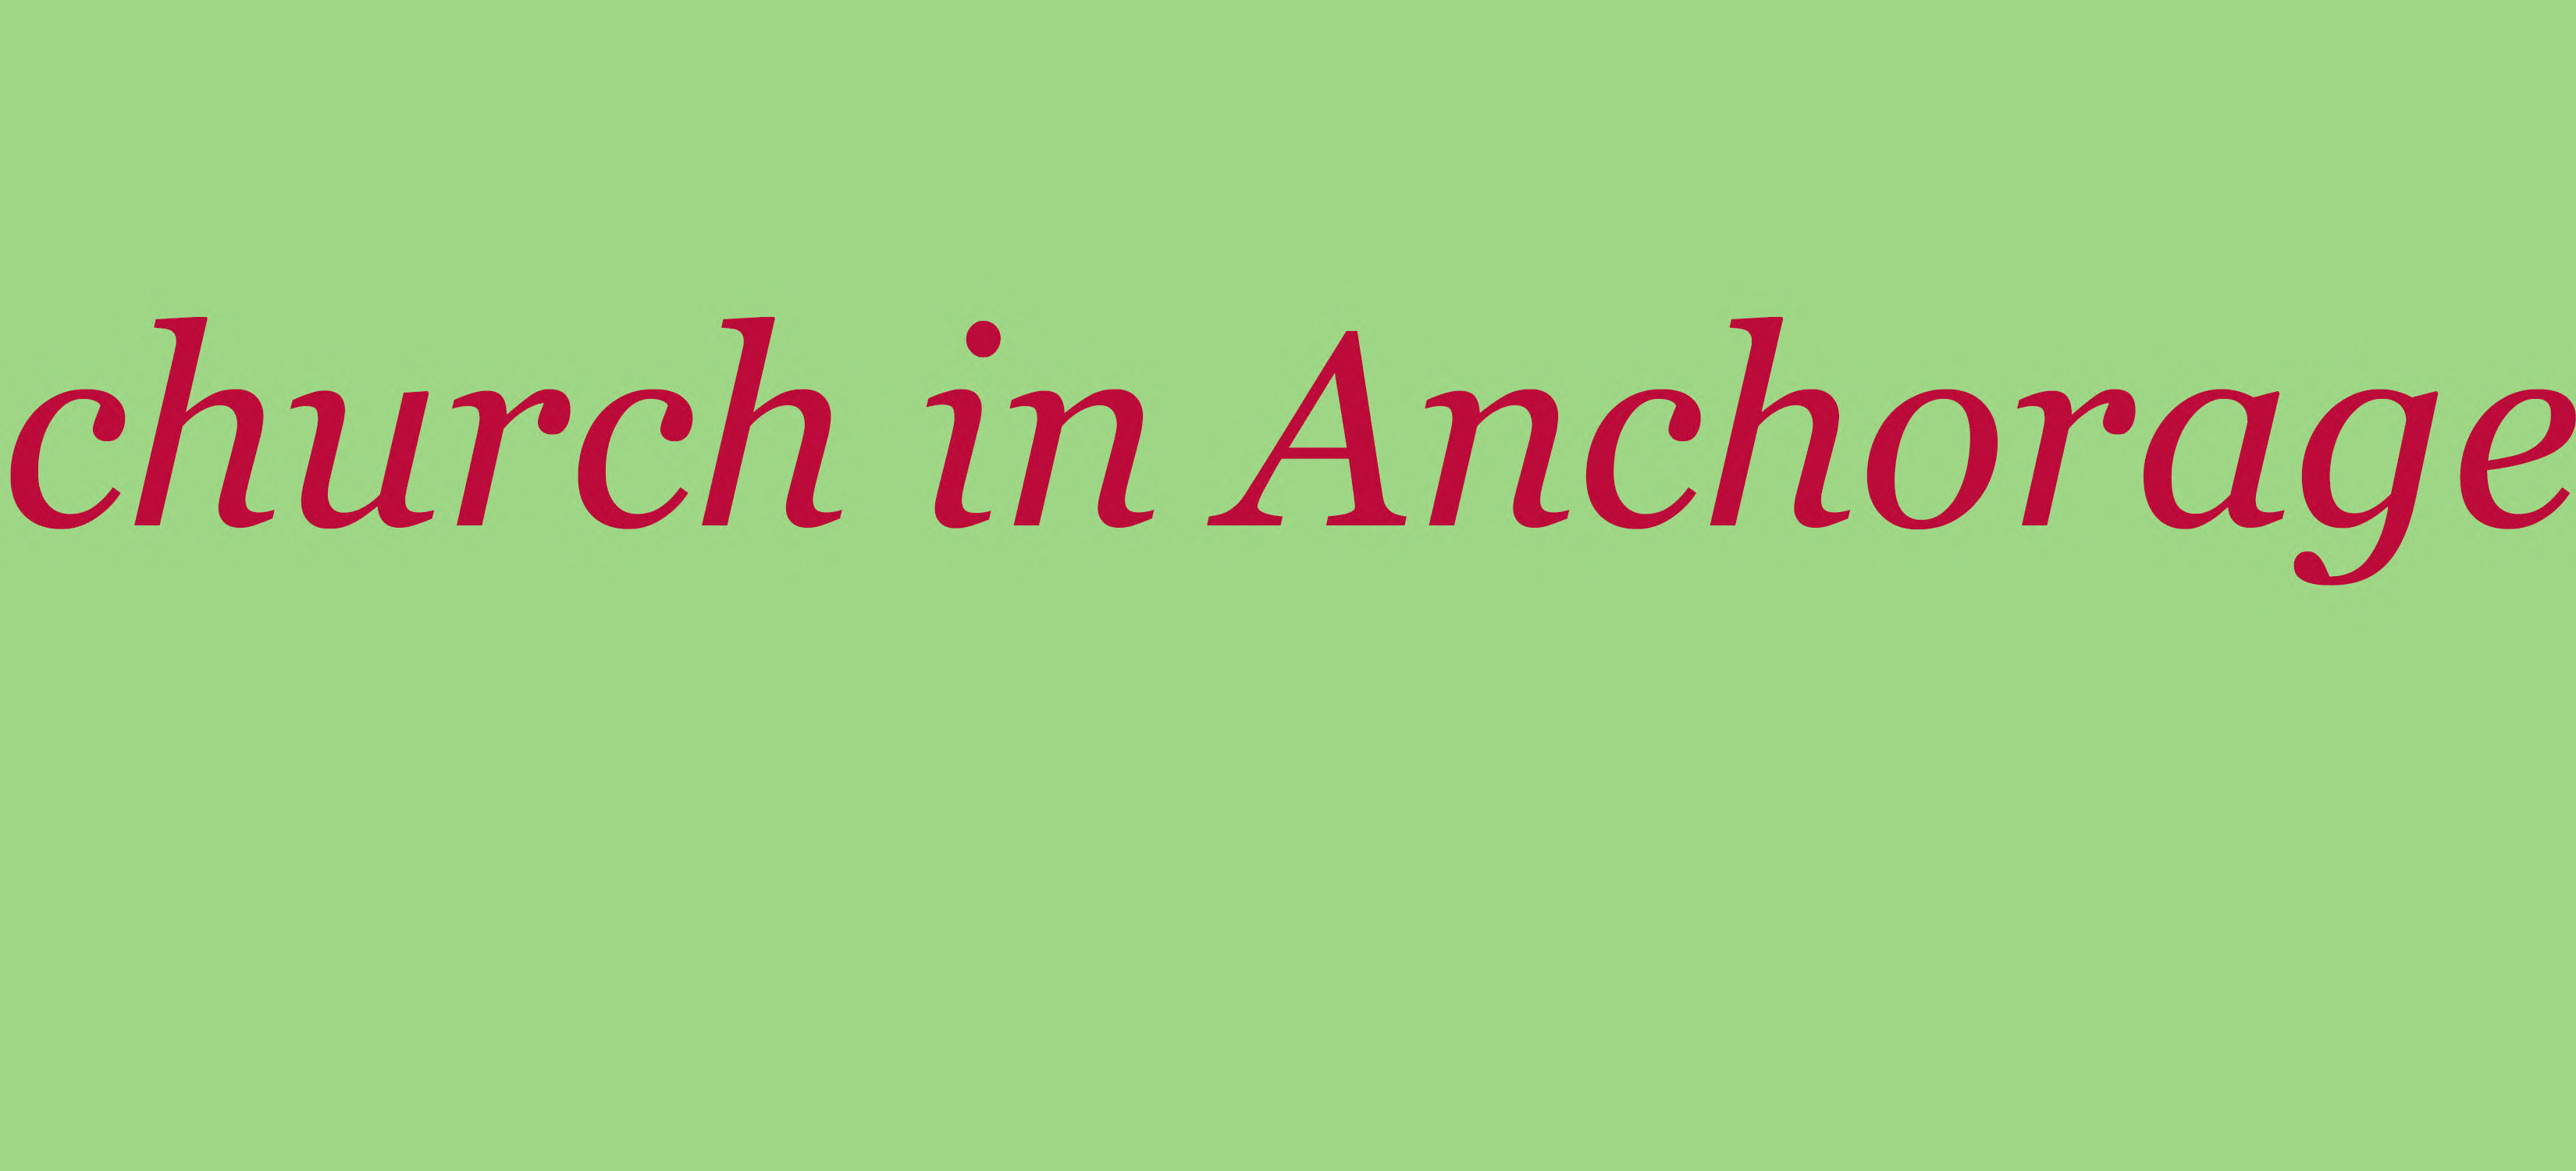 church in Anchorage